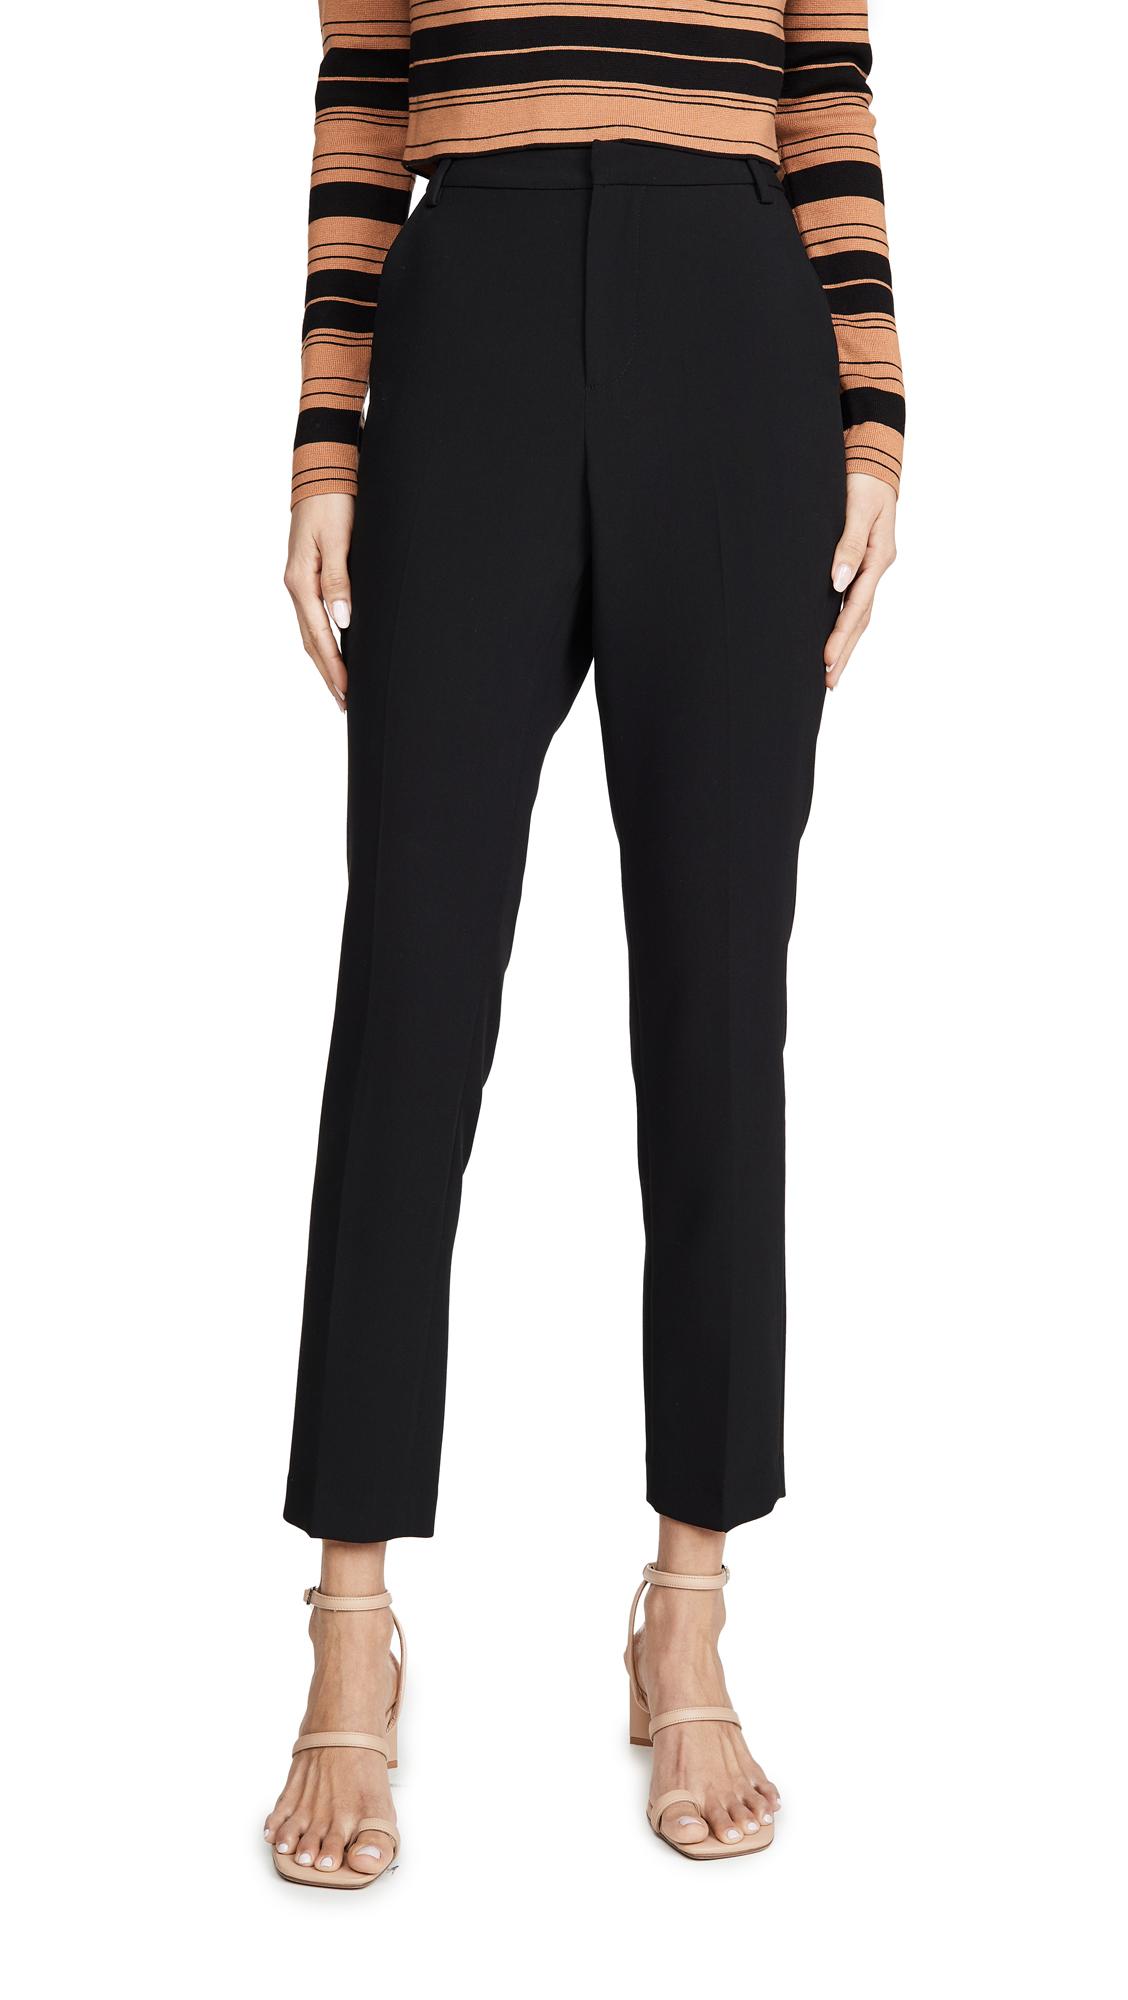 L'AGENCE Eleanor Full Length Pants